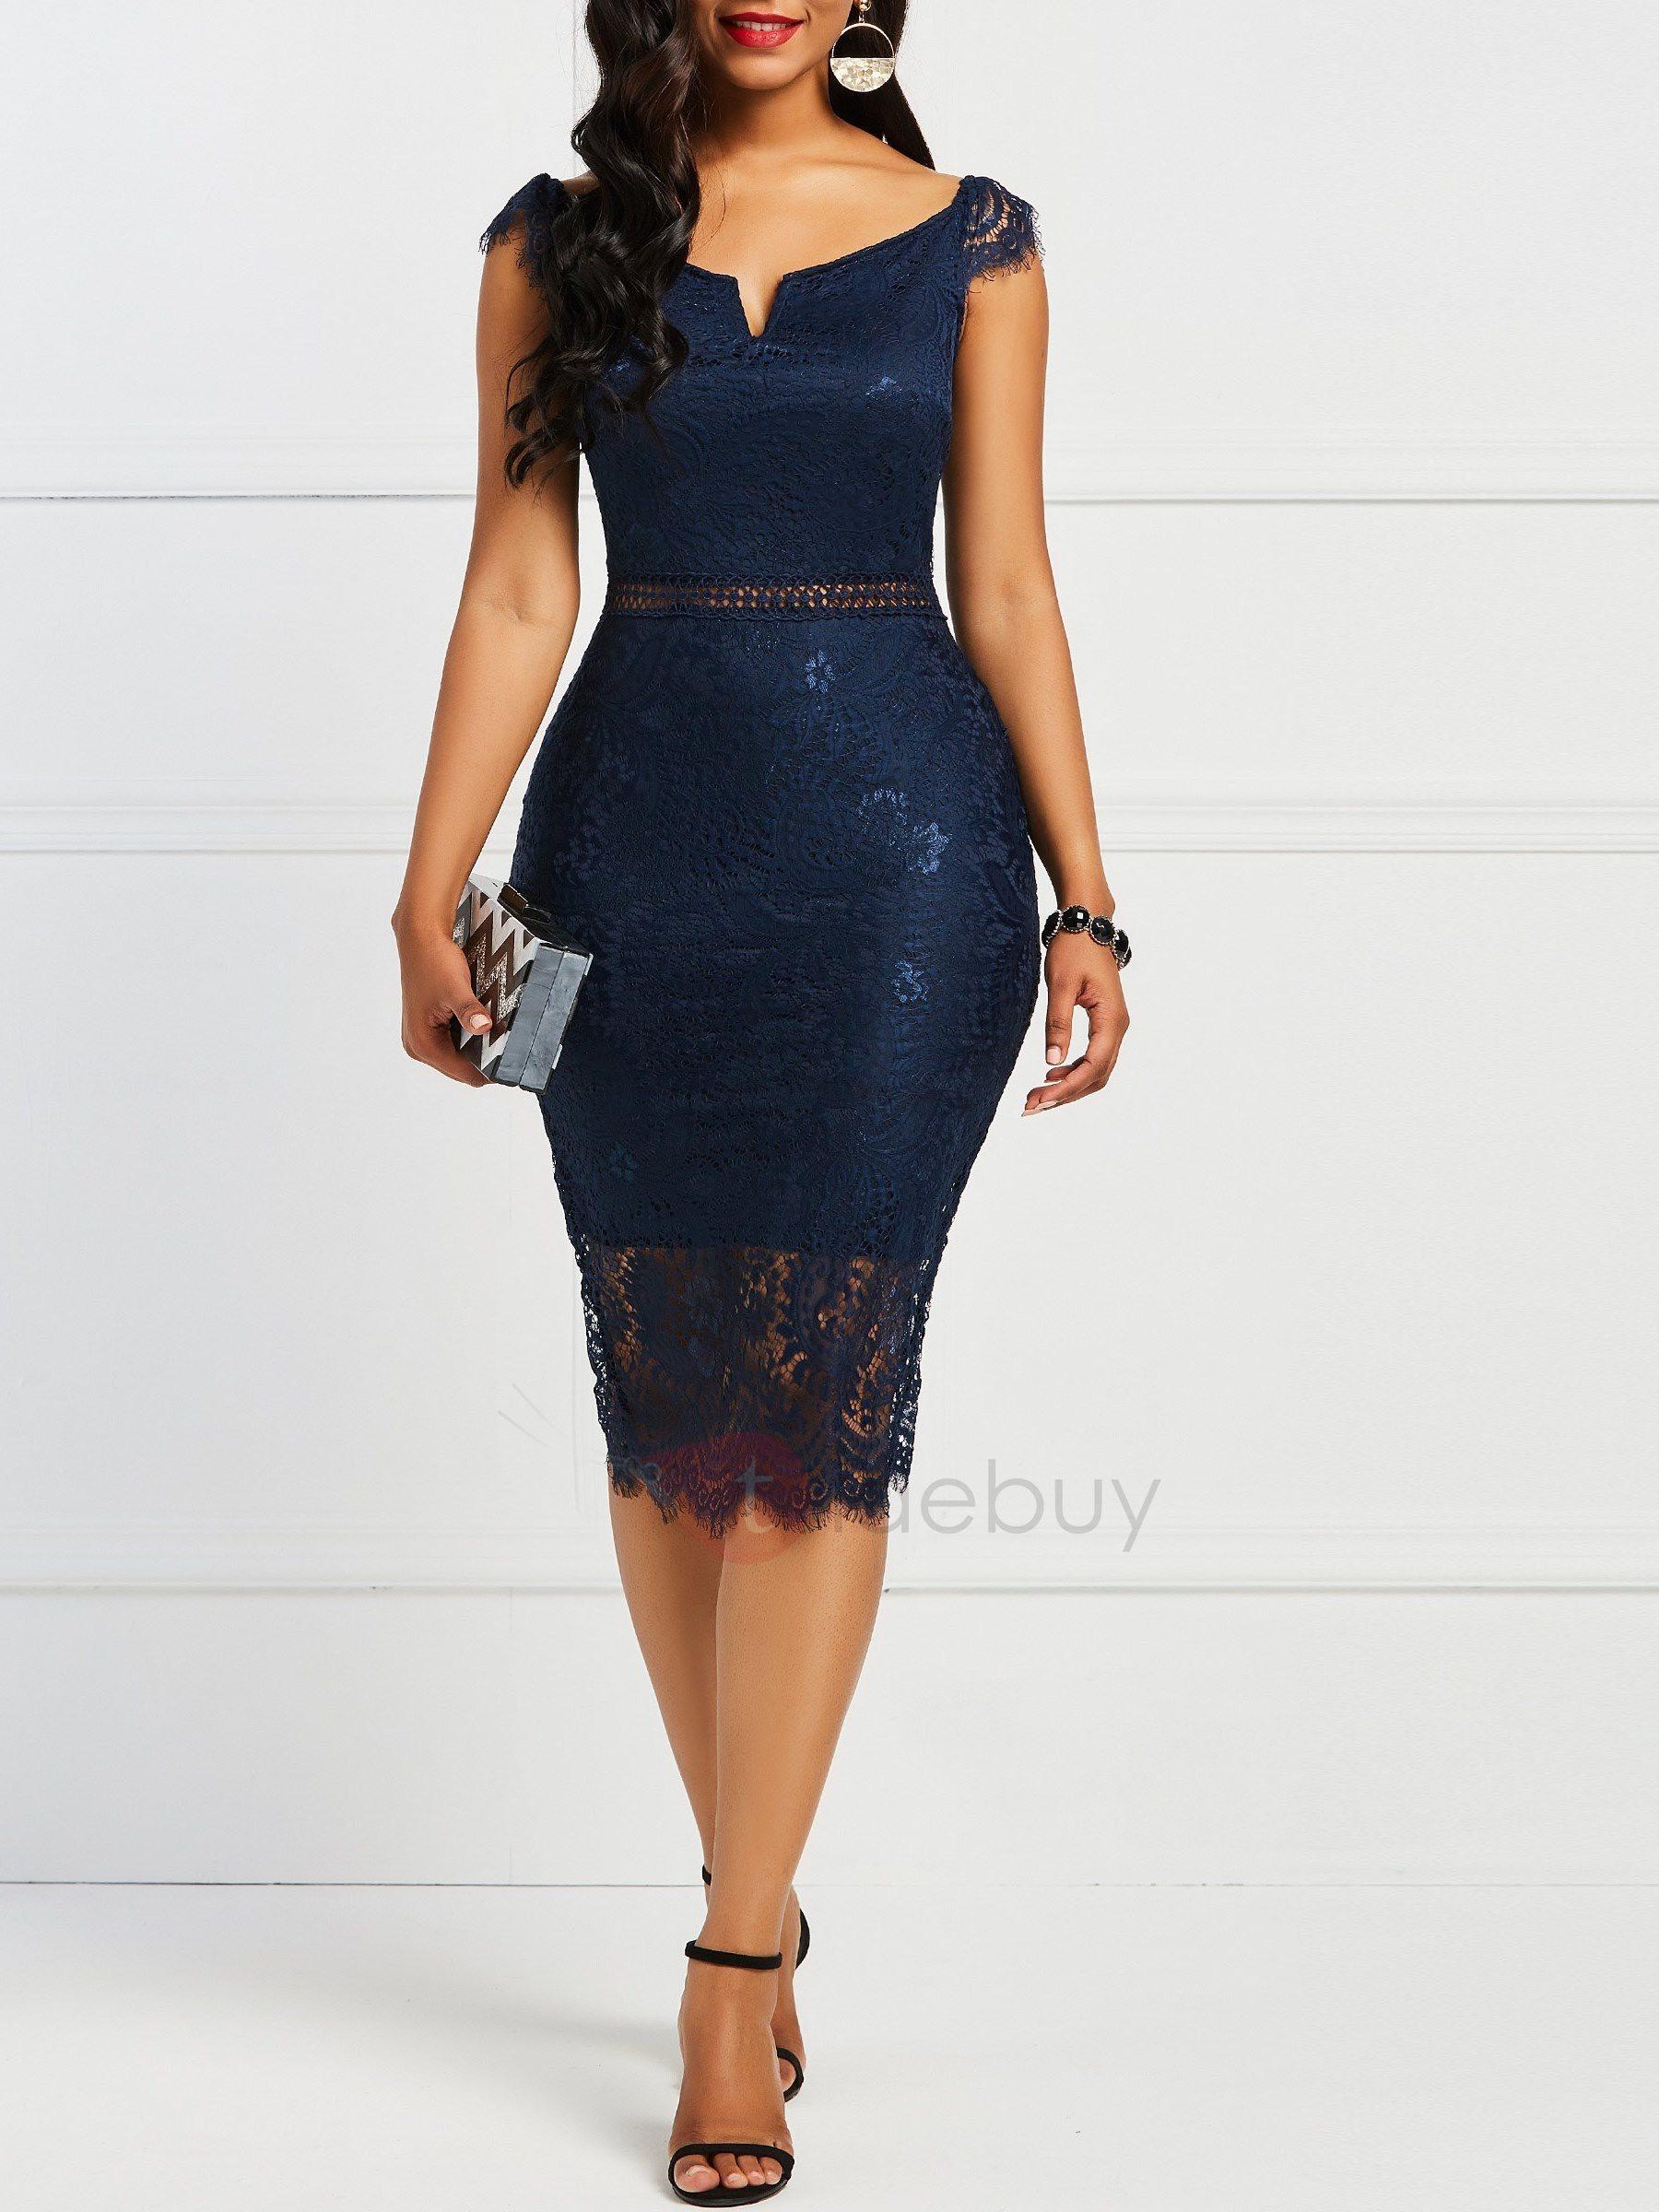 Damen Elegant Etuikleider Business Kleider  Tidebuy De